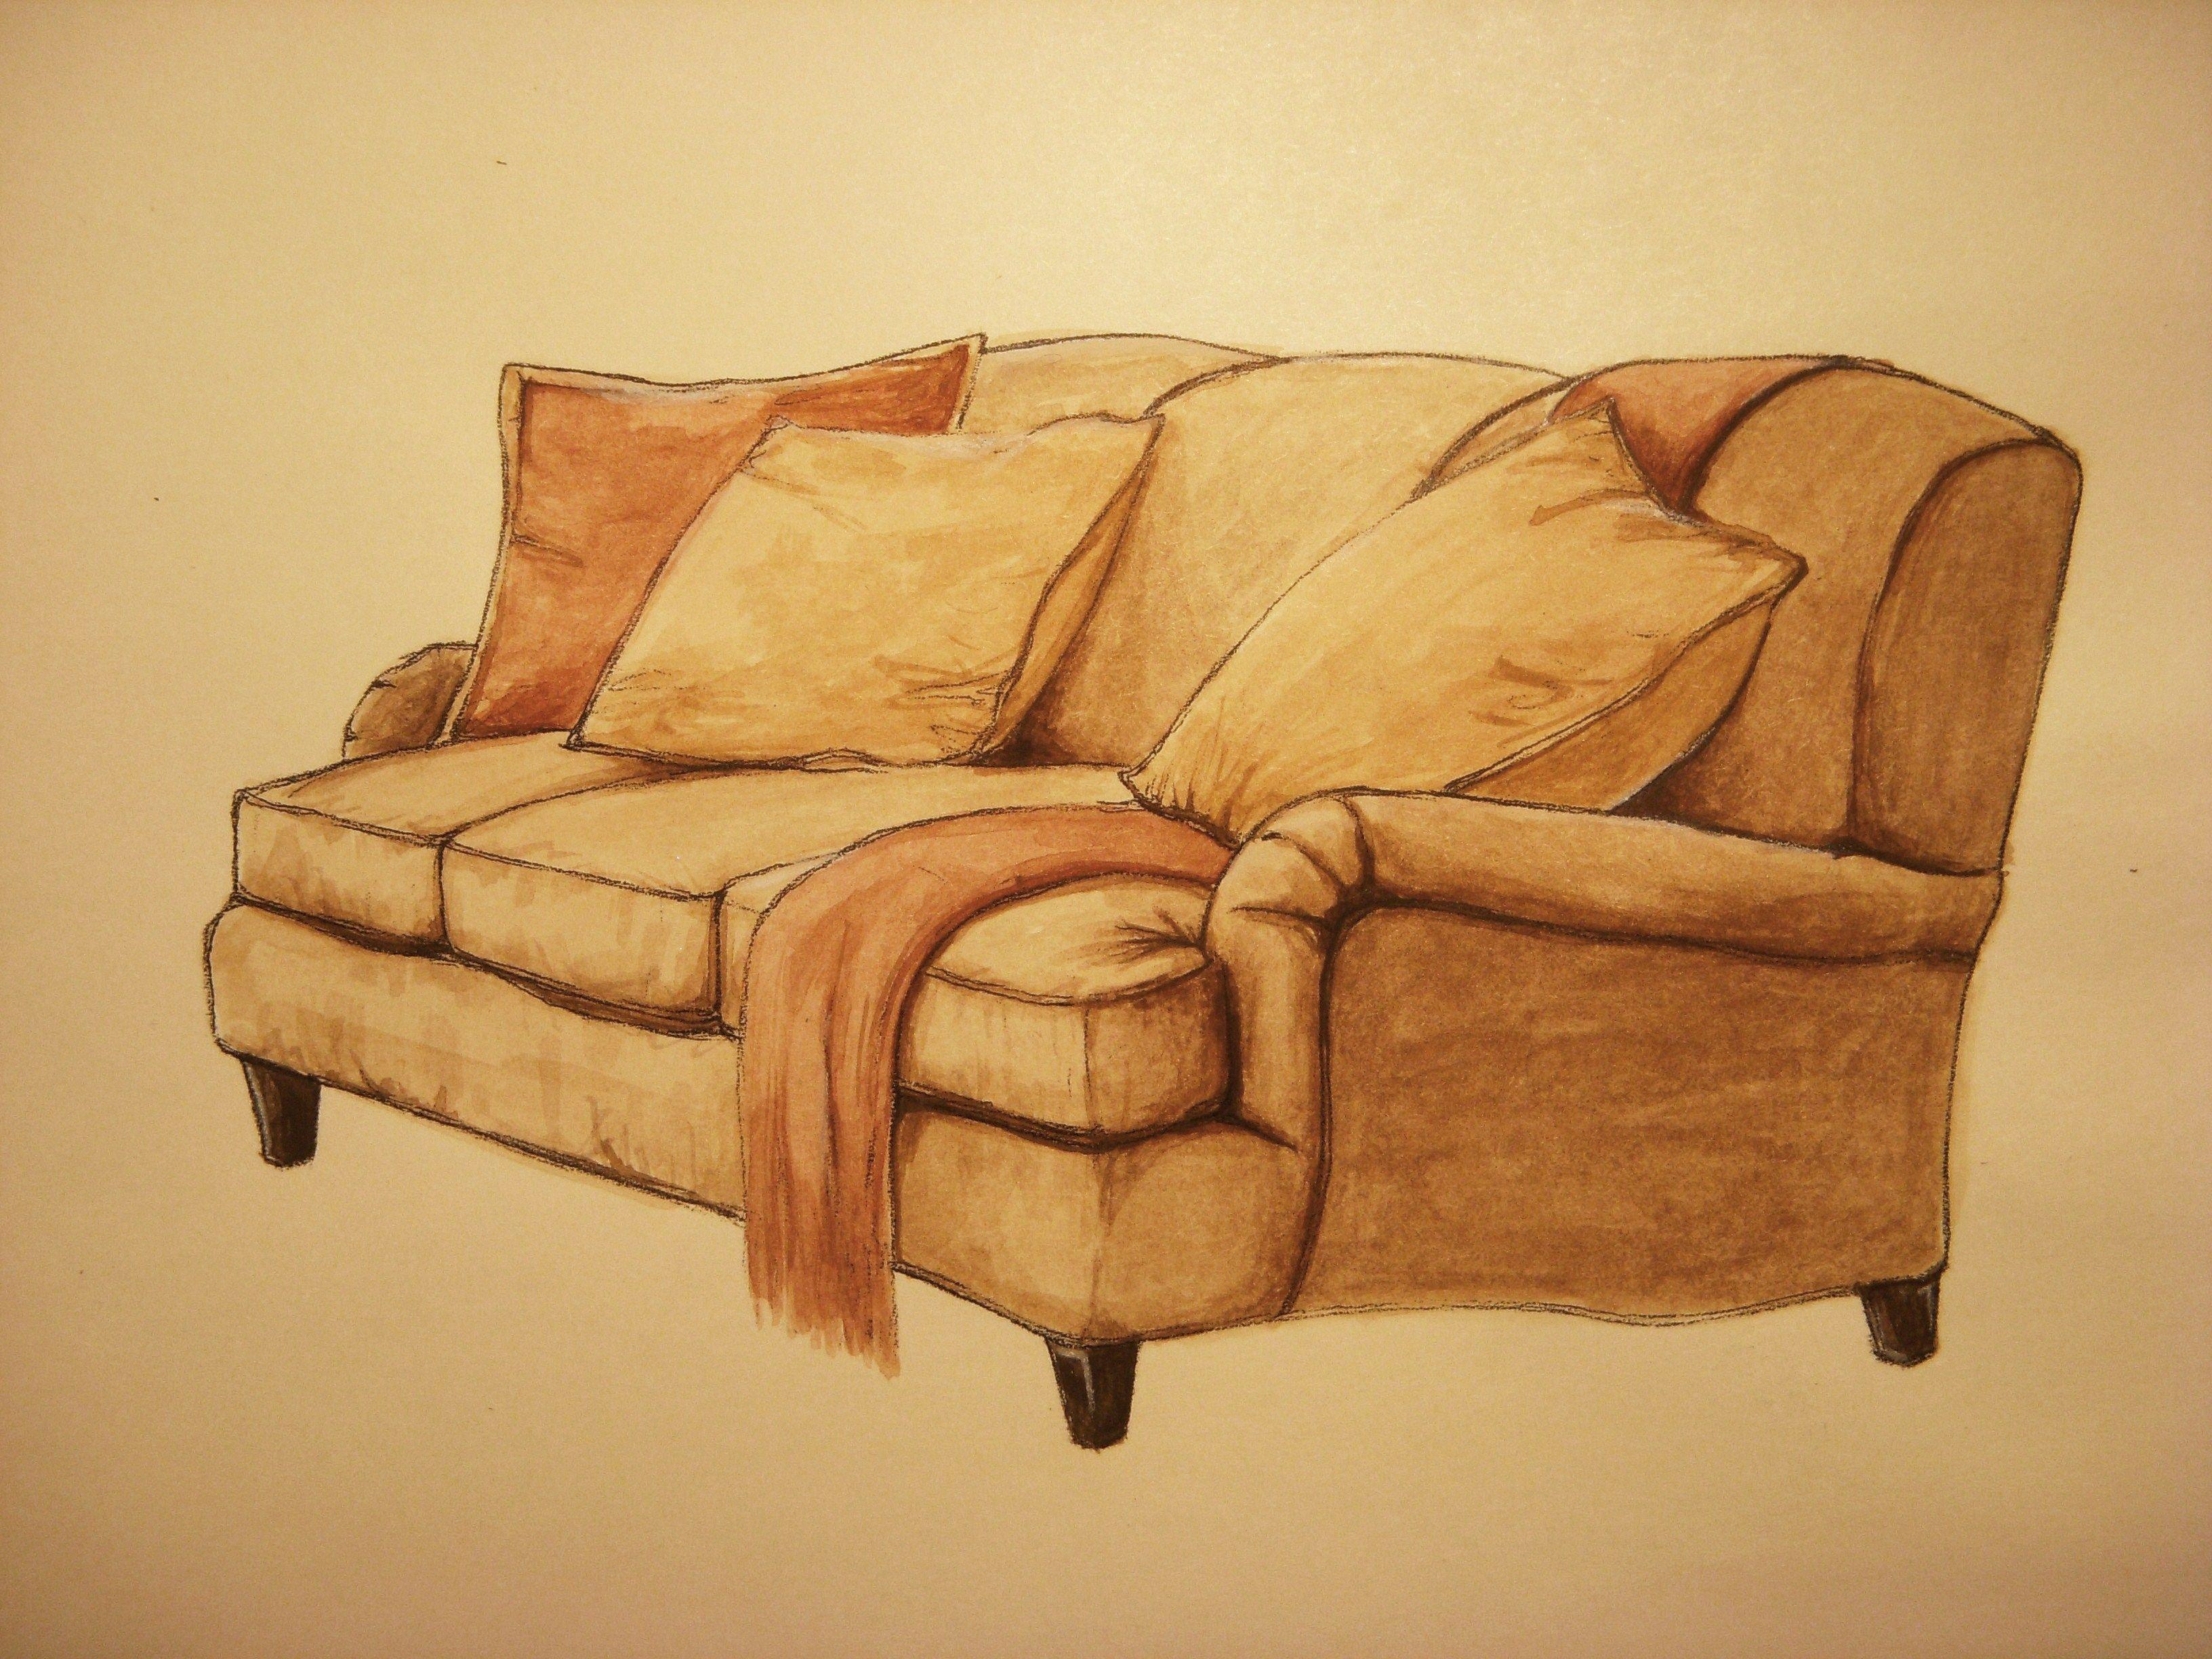 Sofa gouache hae lee ko hand rendering interiors for Sofa design sketch